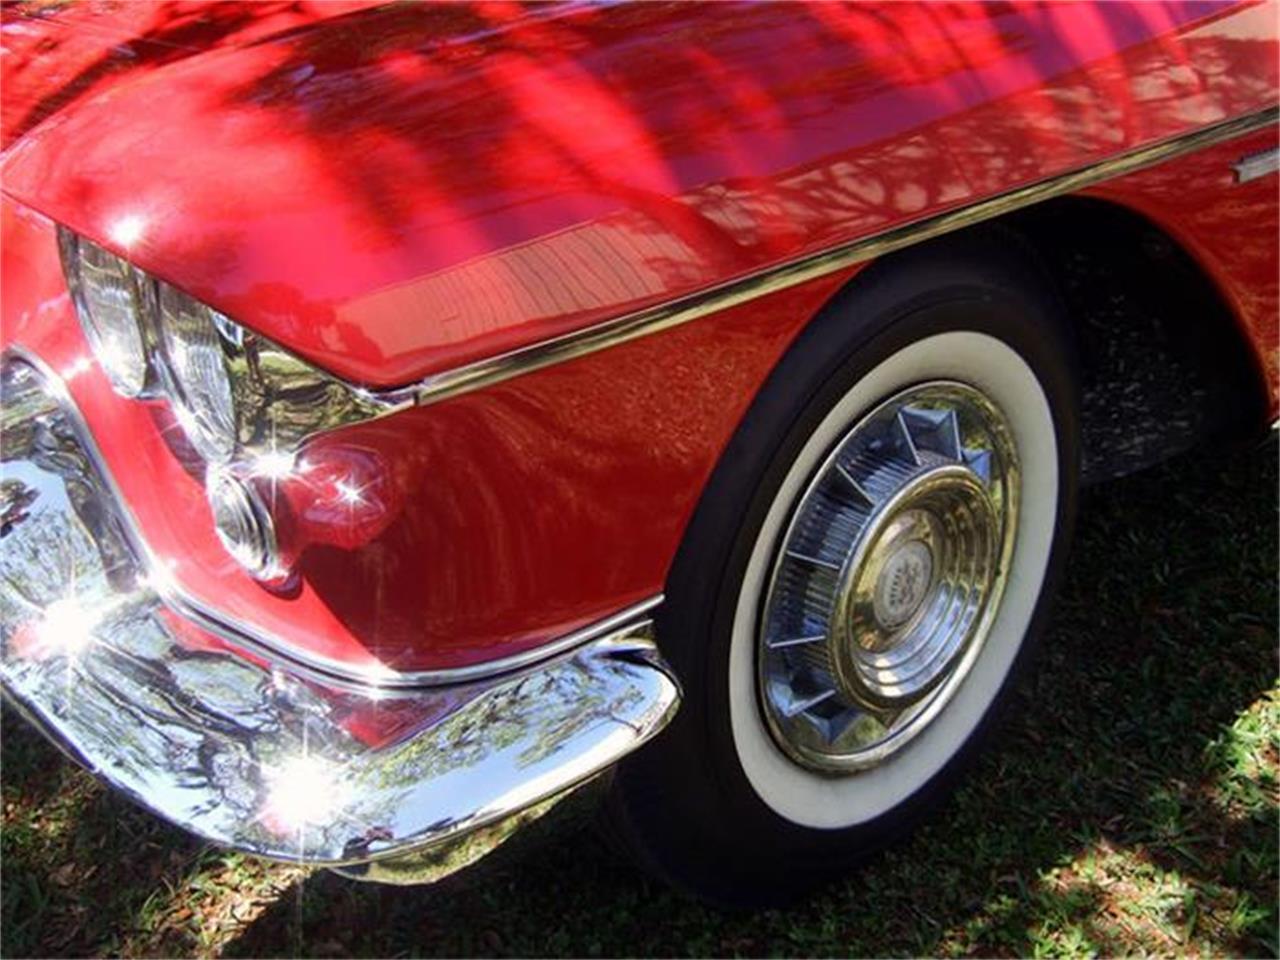 Large Picture of 1958 Cadillac Eldorado Brougham located in Sarasota Florida - $169,900.00 - B3EW